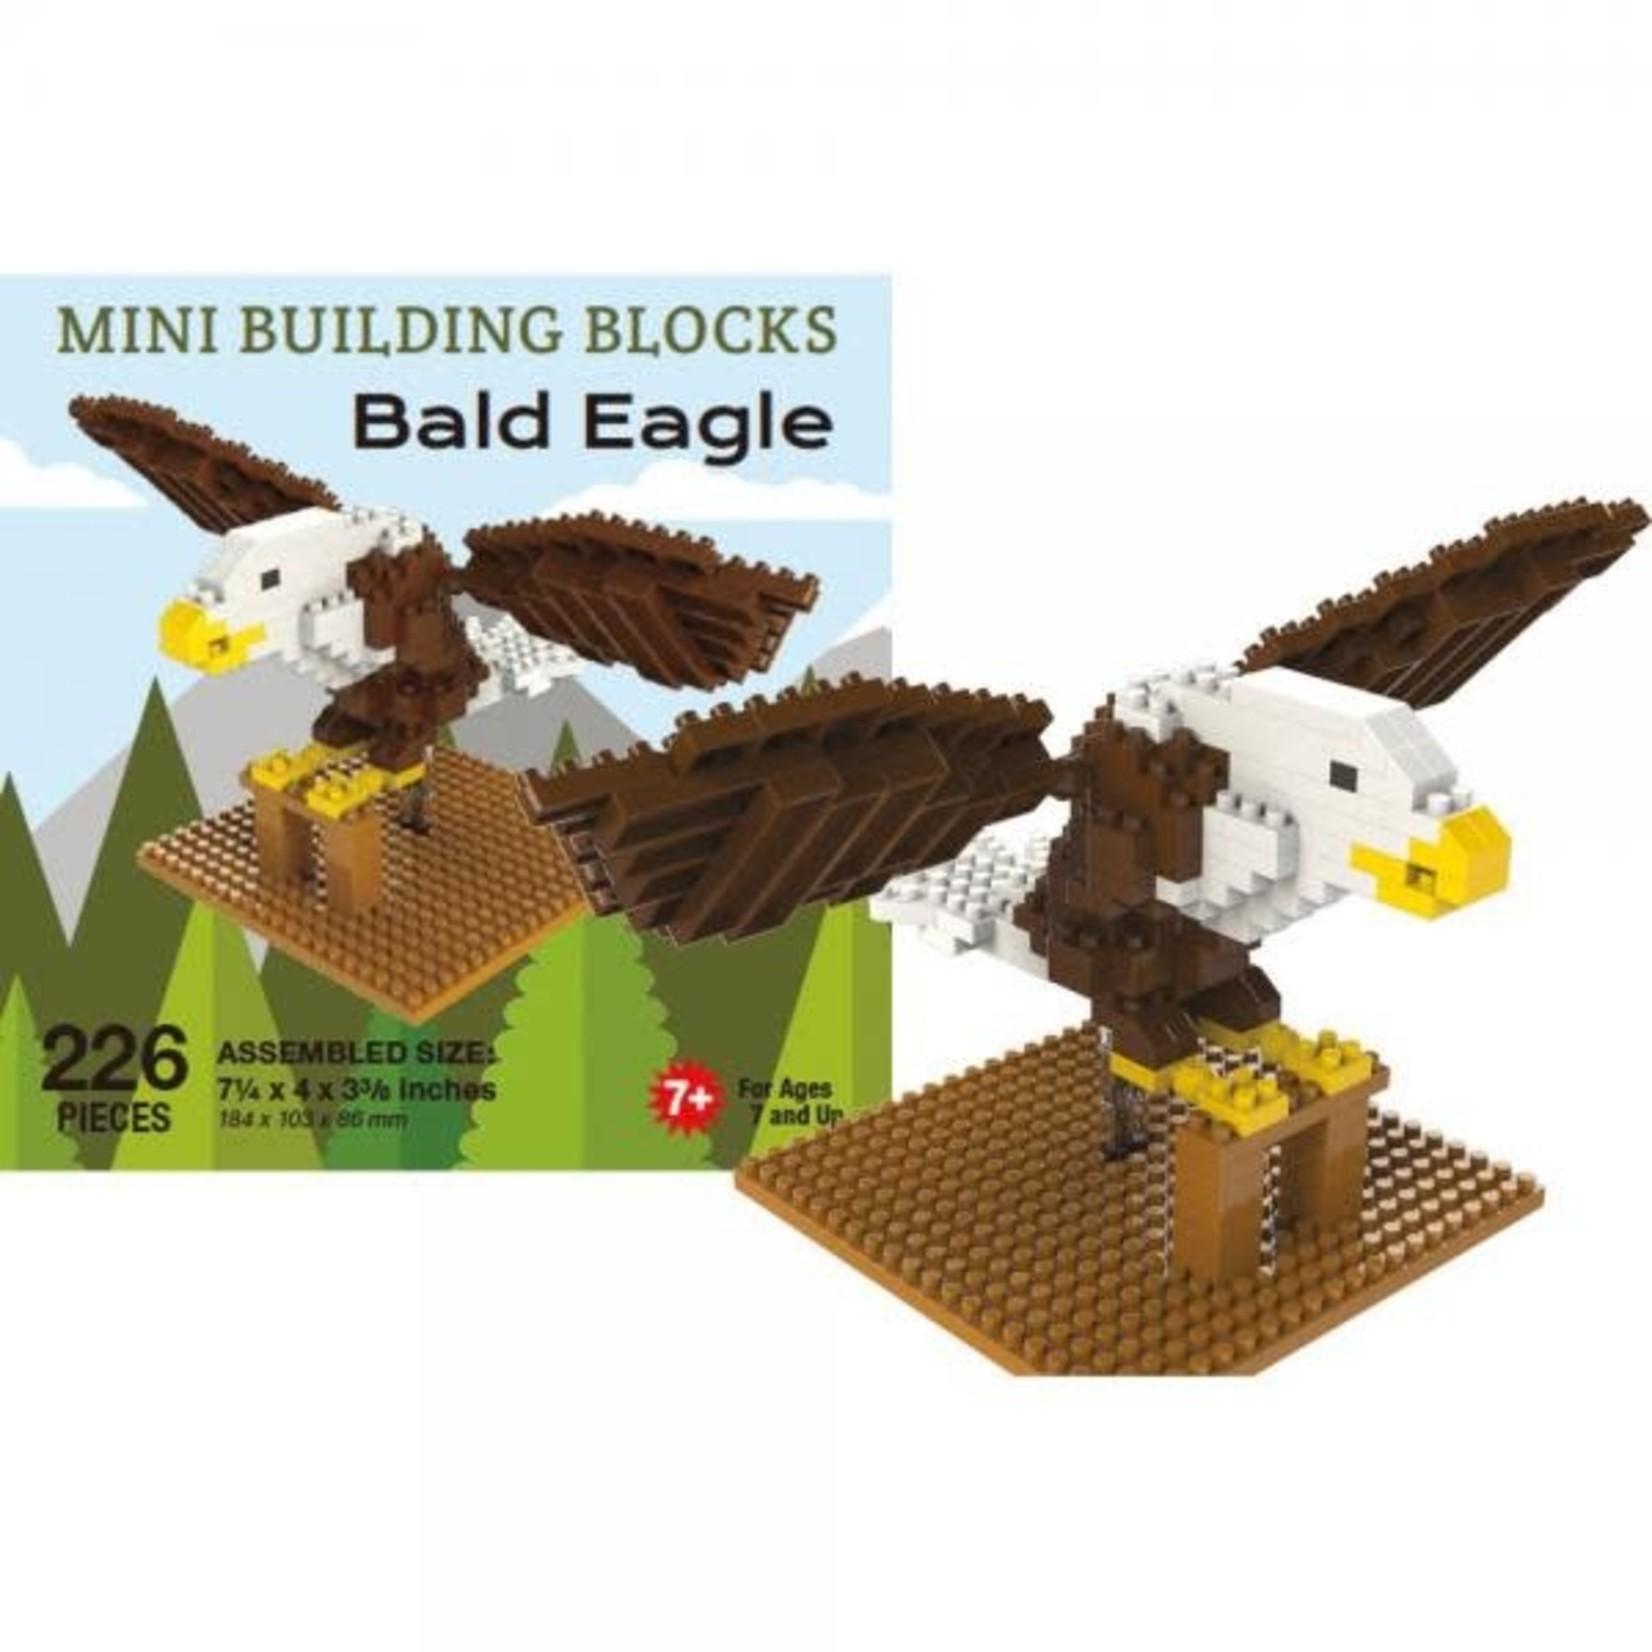 Mini Building Blocks Set - Bald Eagle